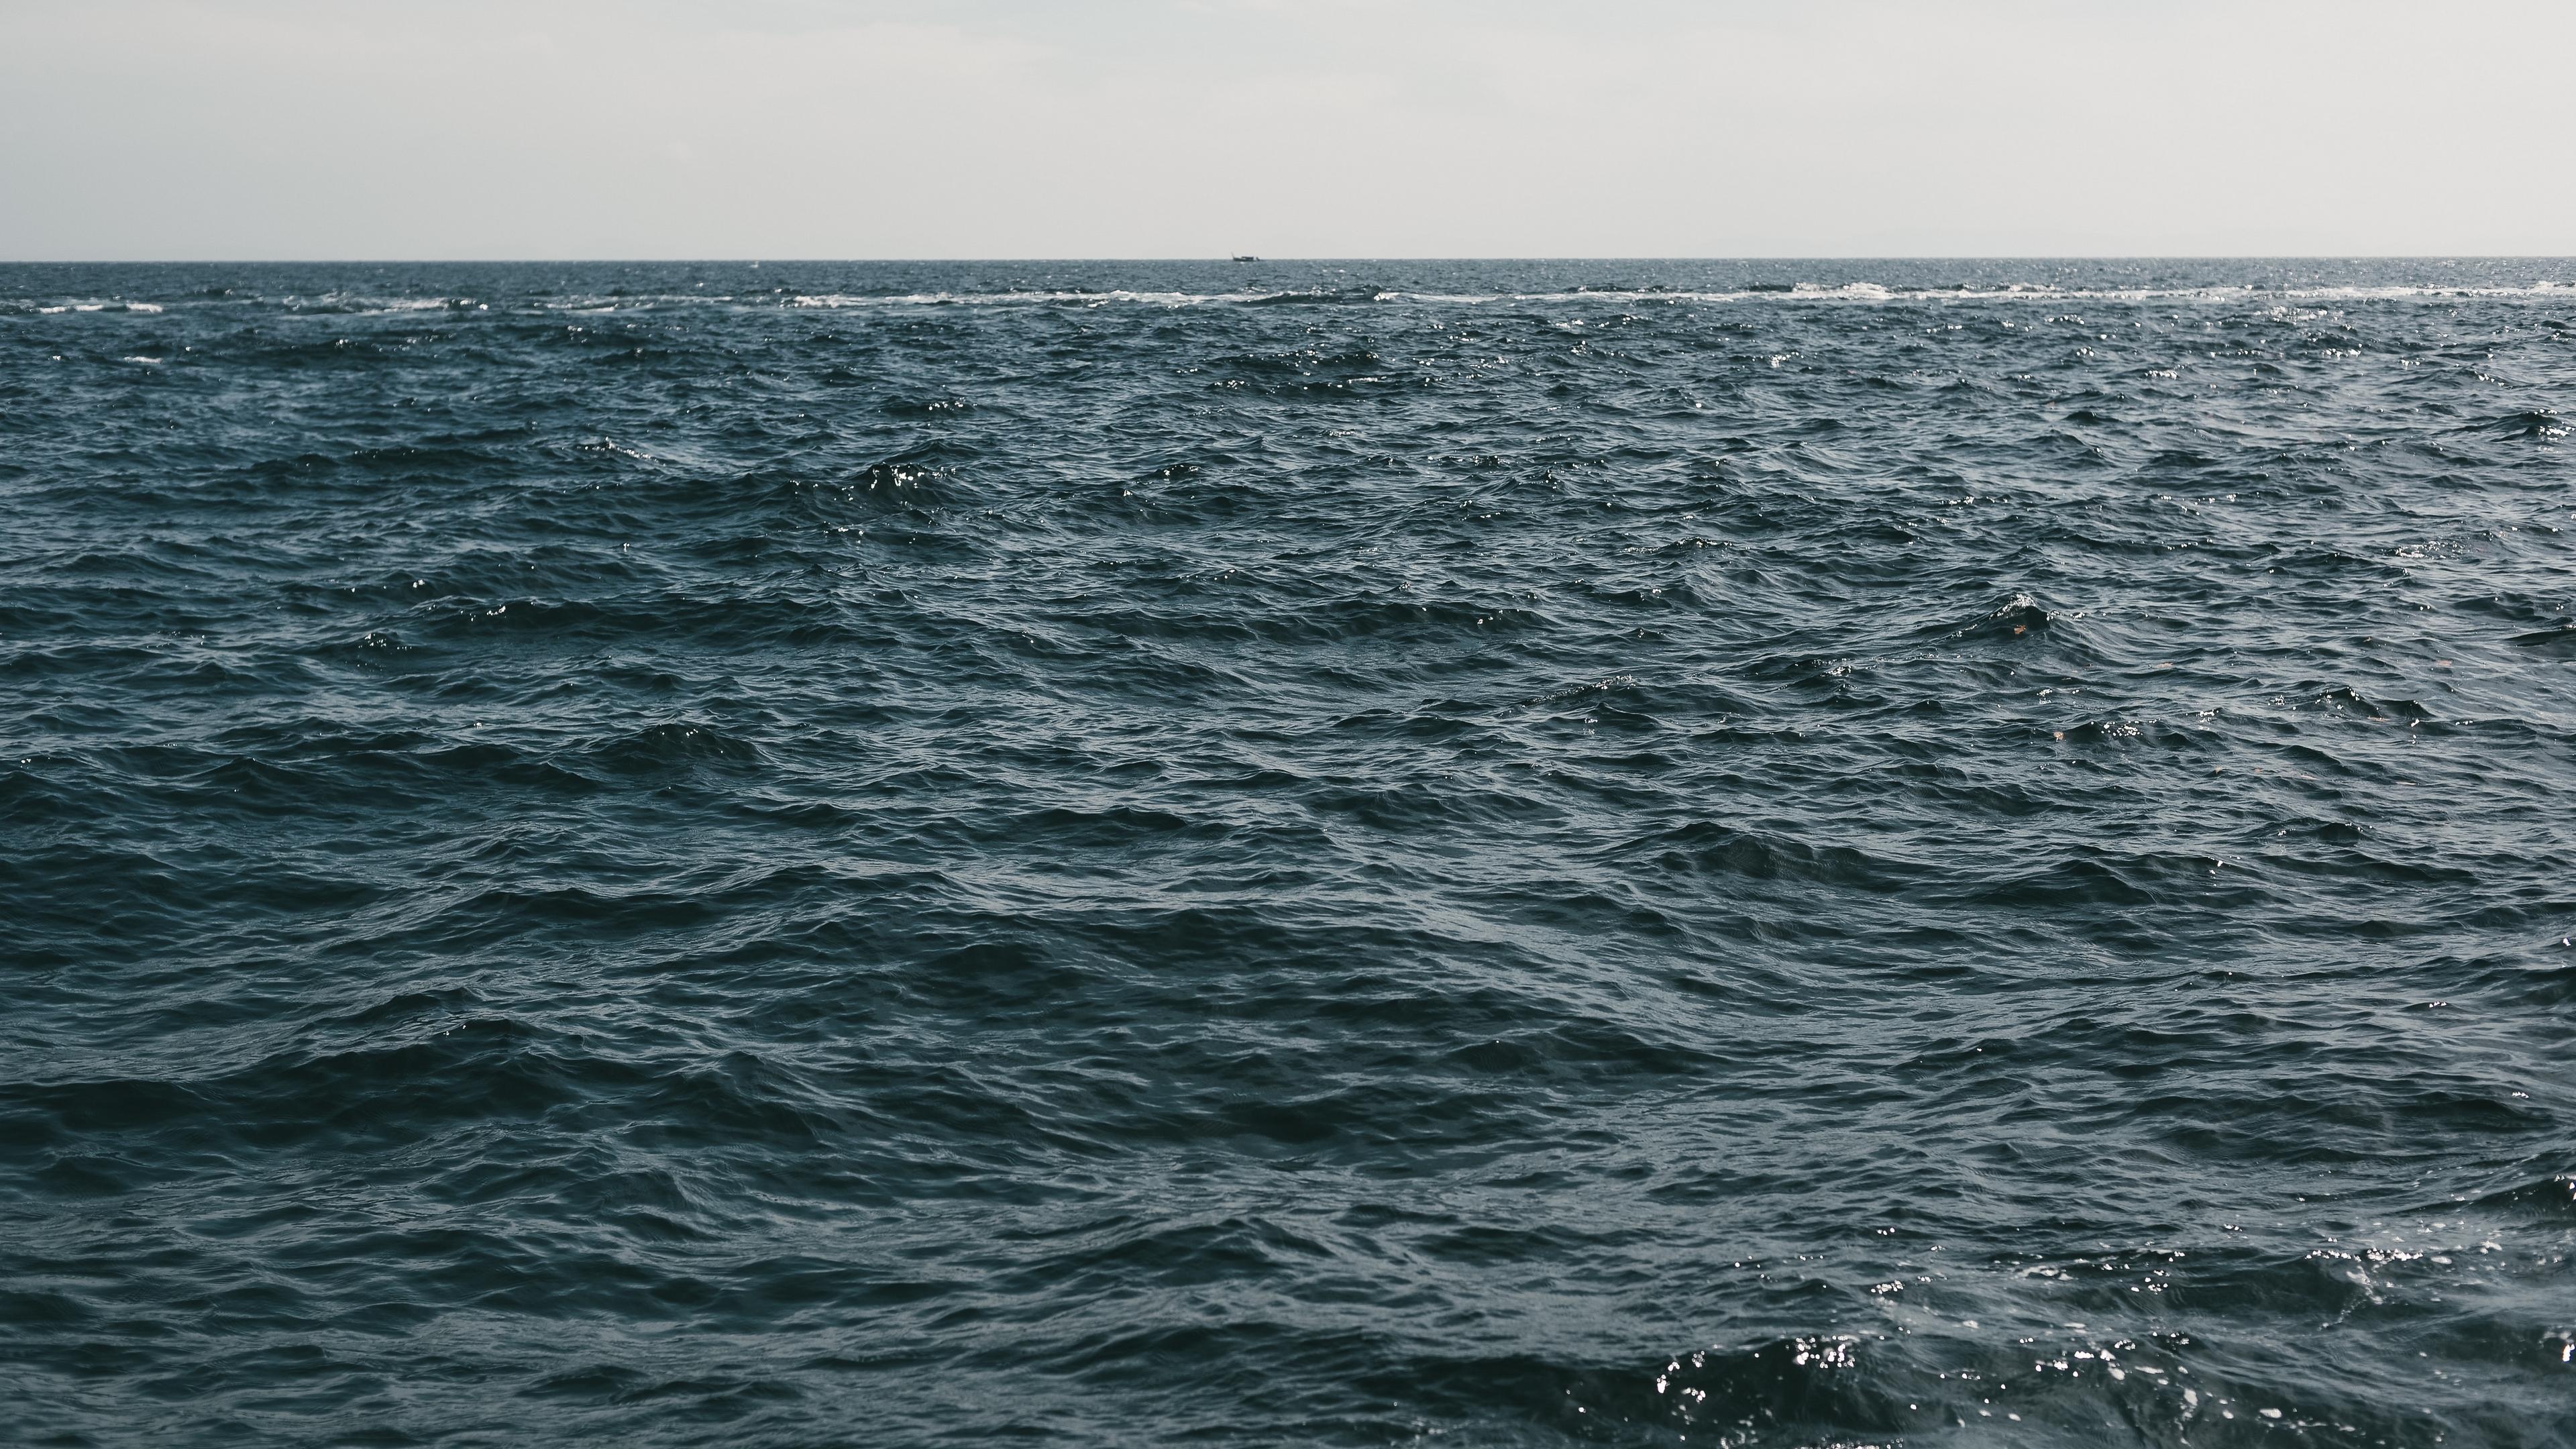 water sea horizon waves 4k 1541114106 - water, sea, horizon, waves 4k - Water, Sea, Horizon